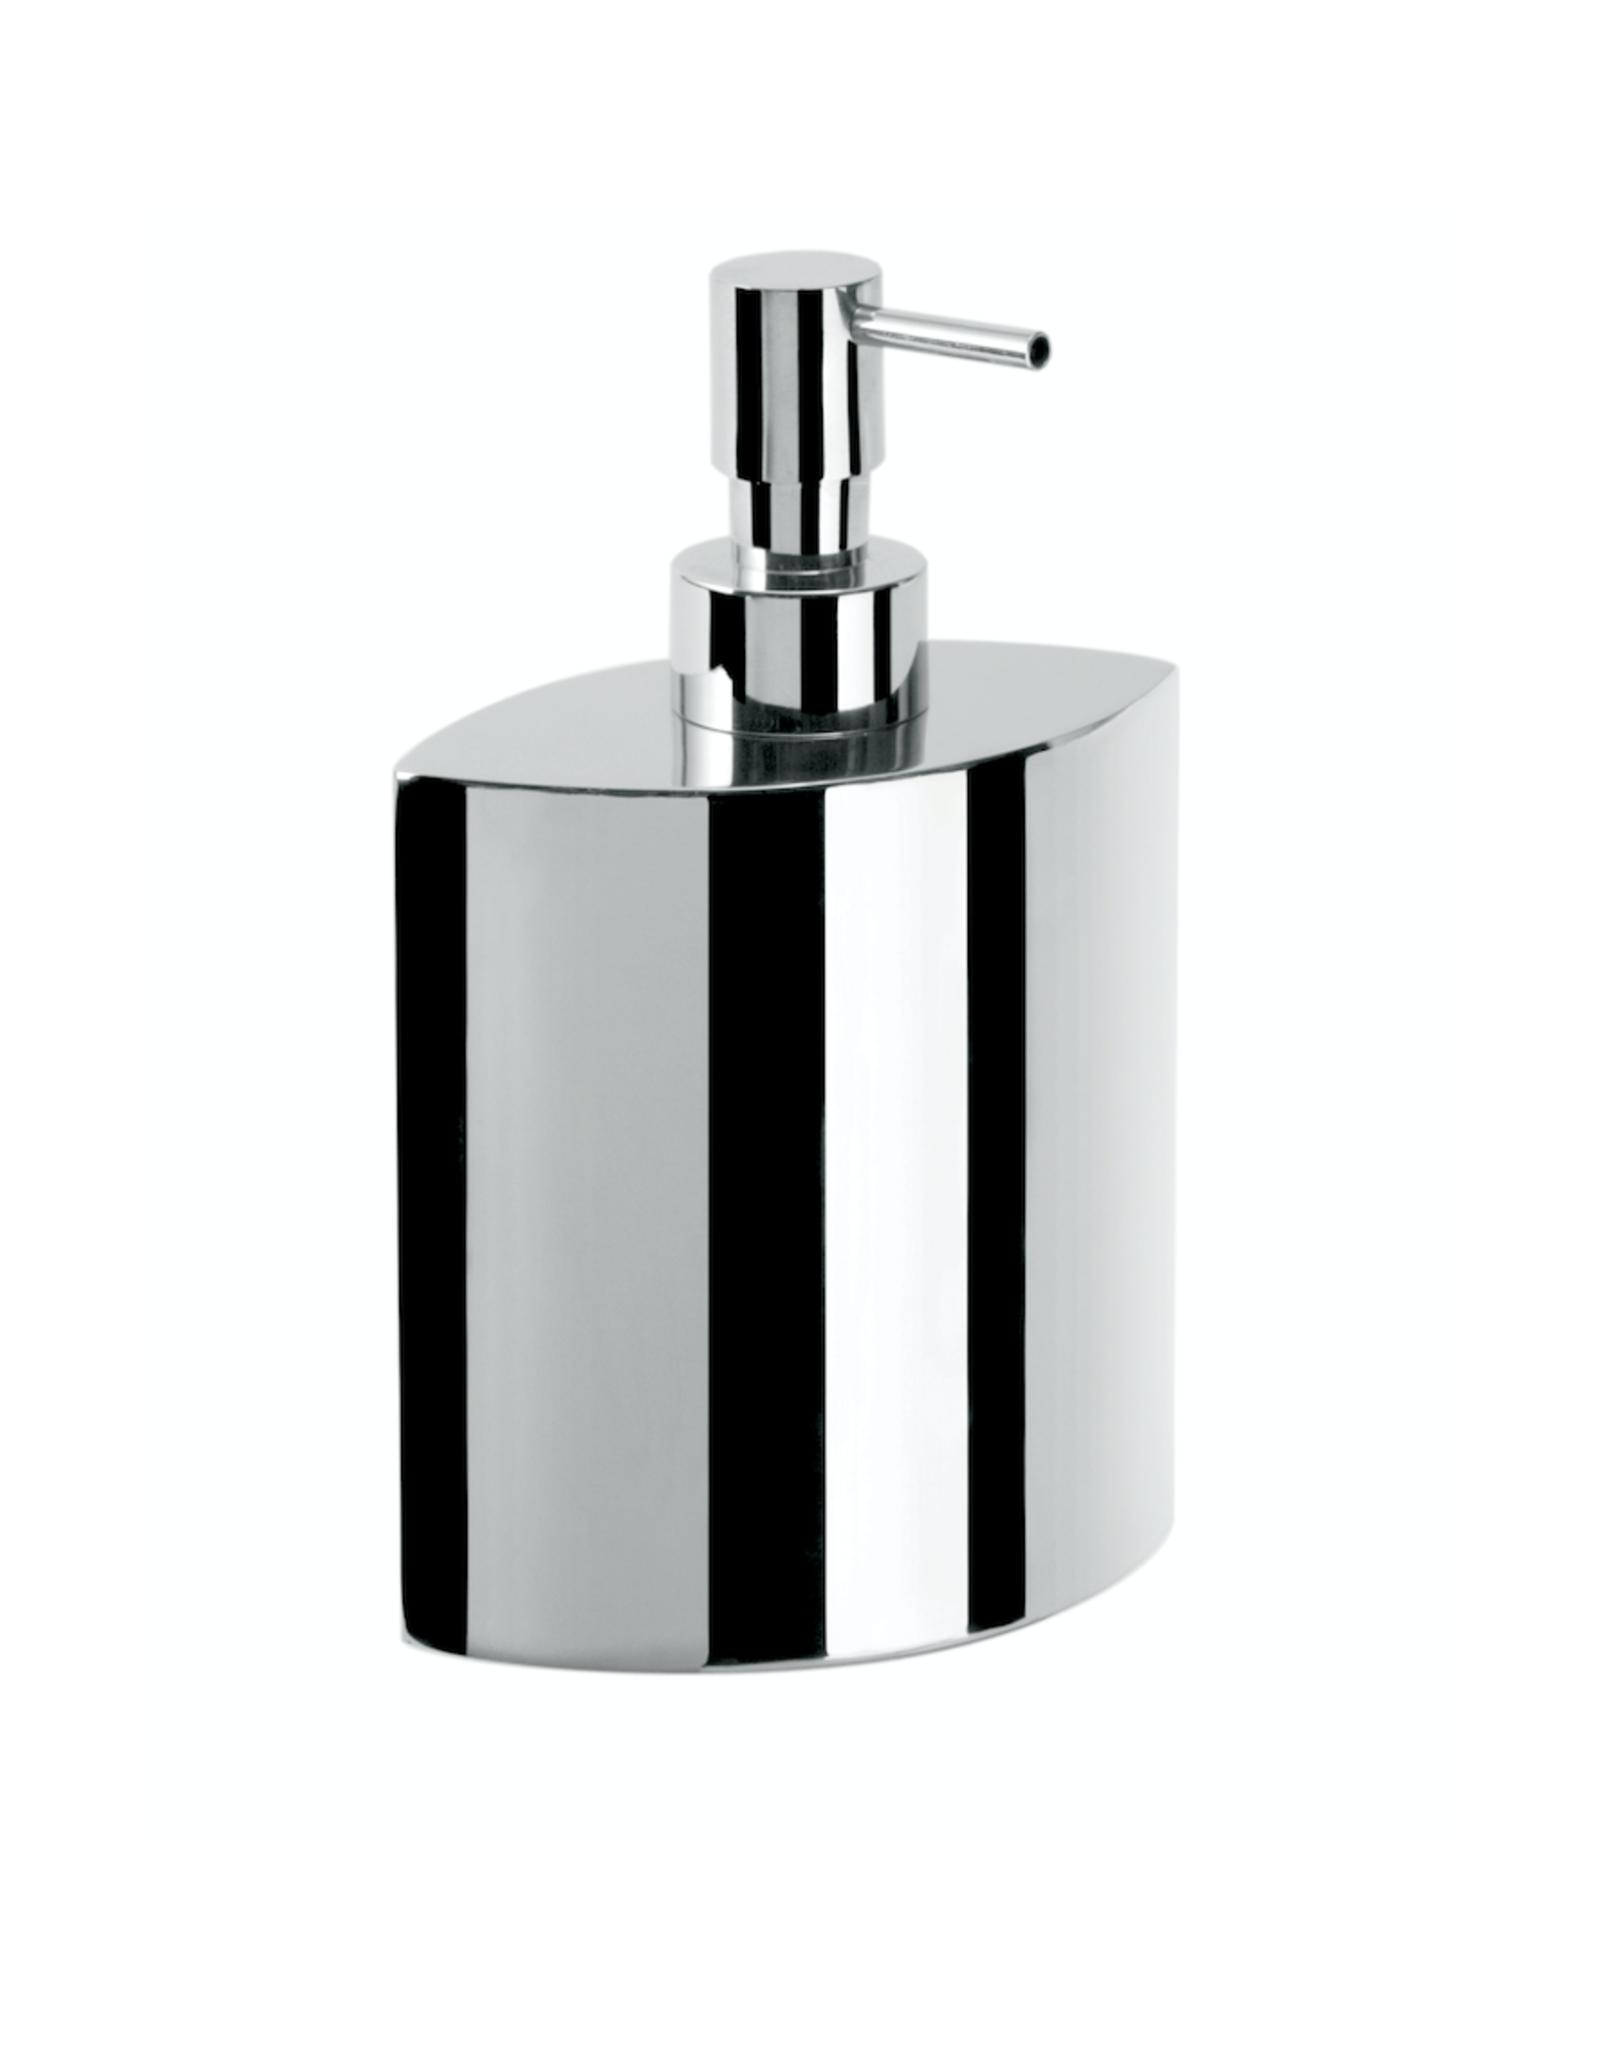 Saon liquid soap dispenser, oval, freestanding - outlet